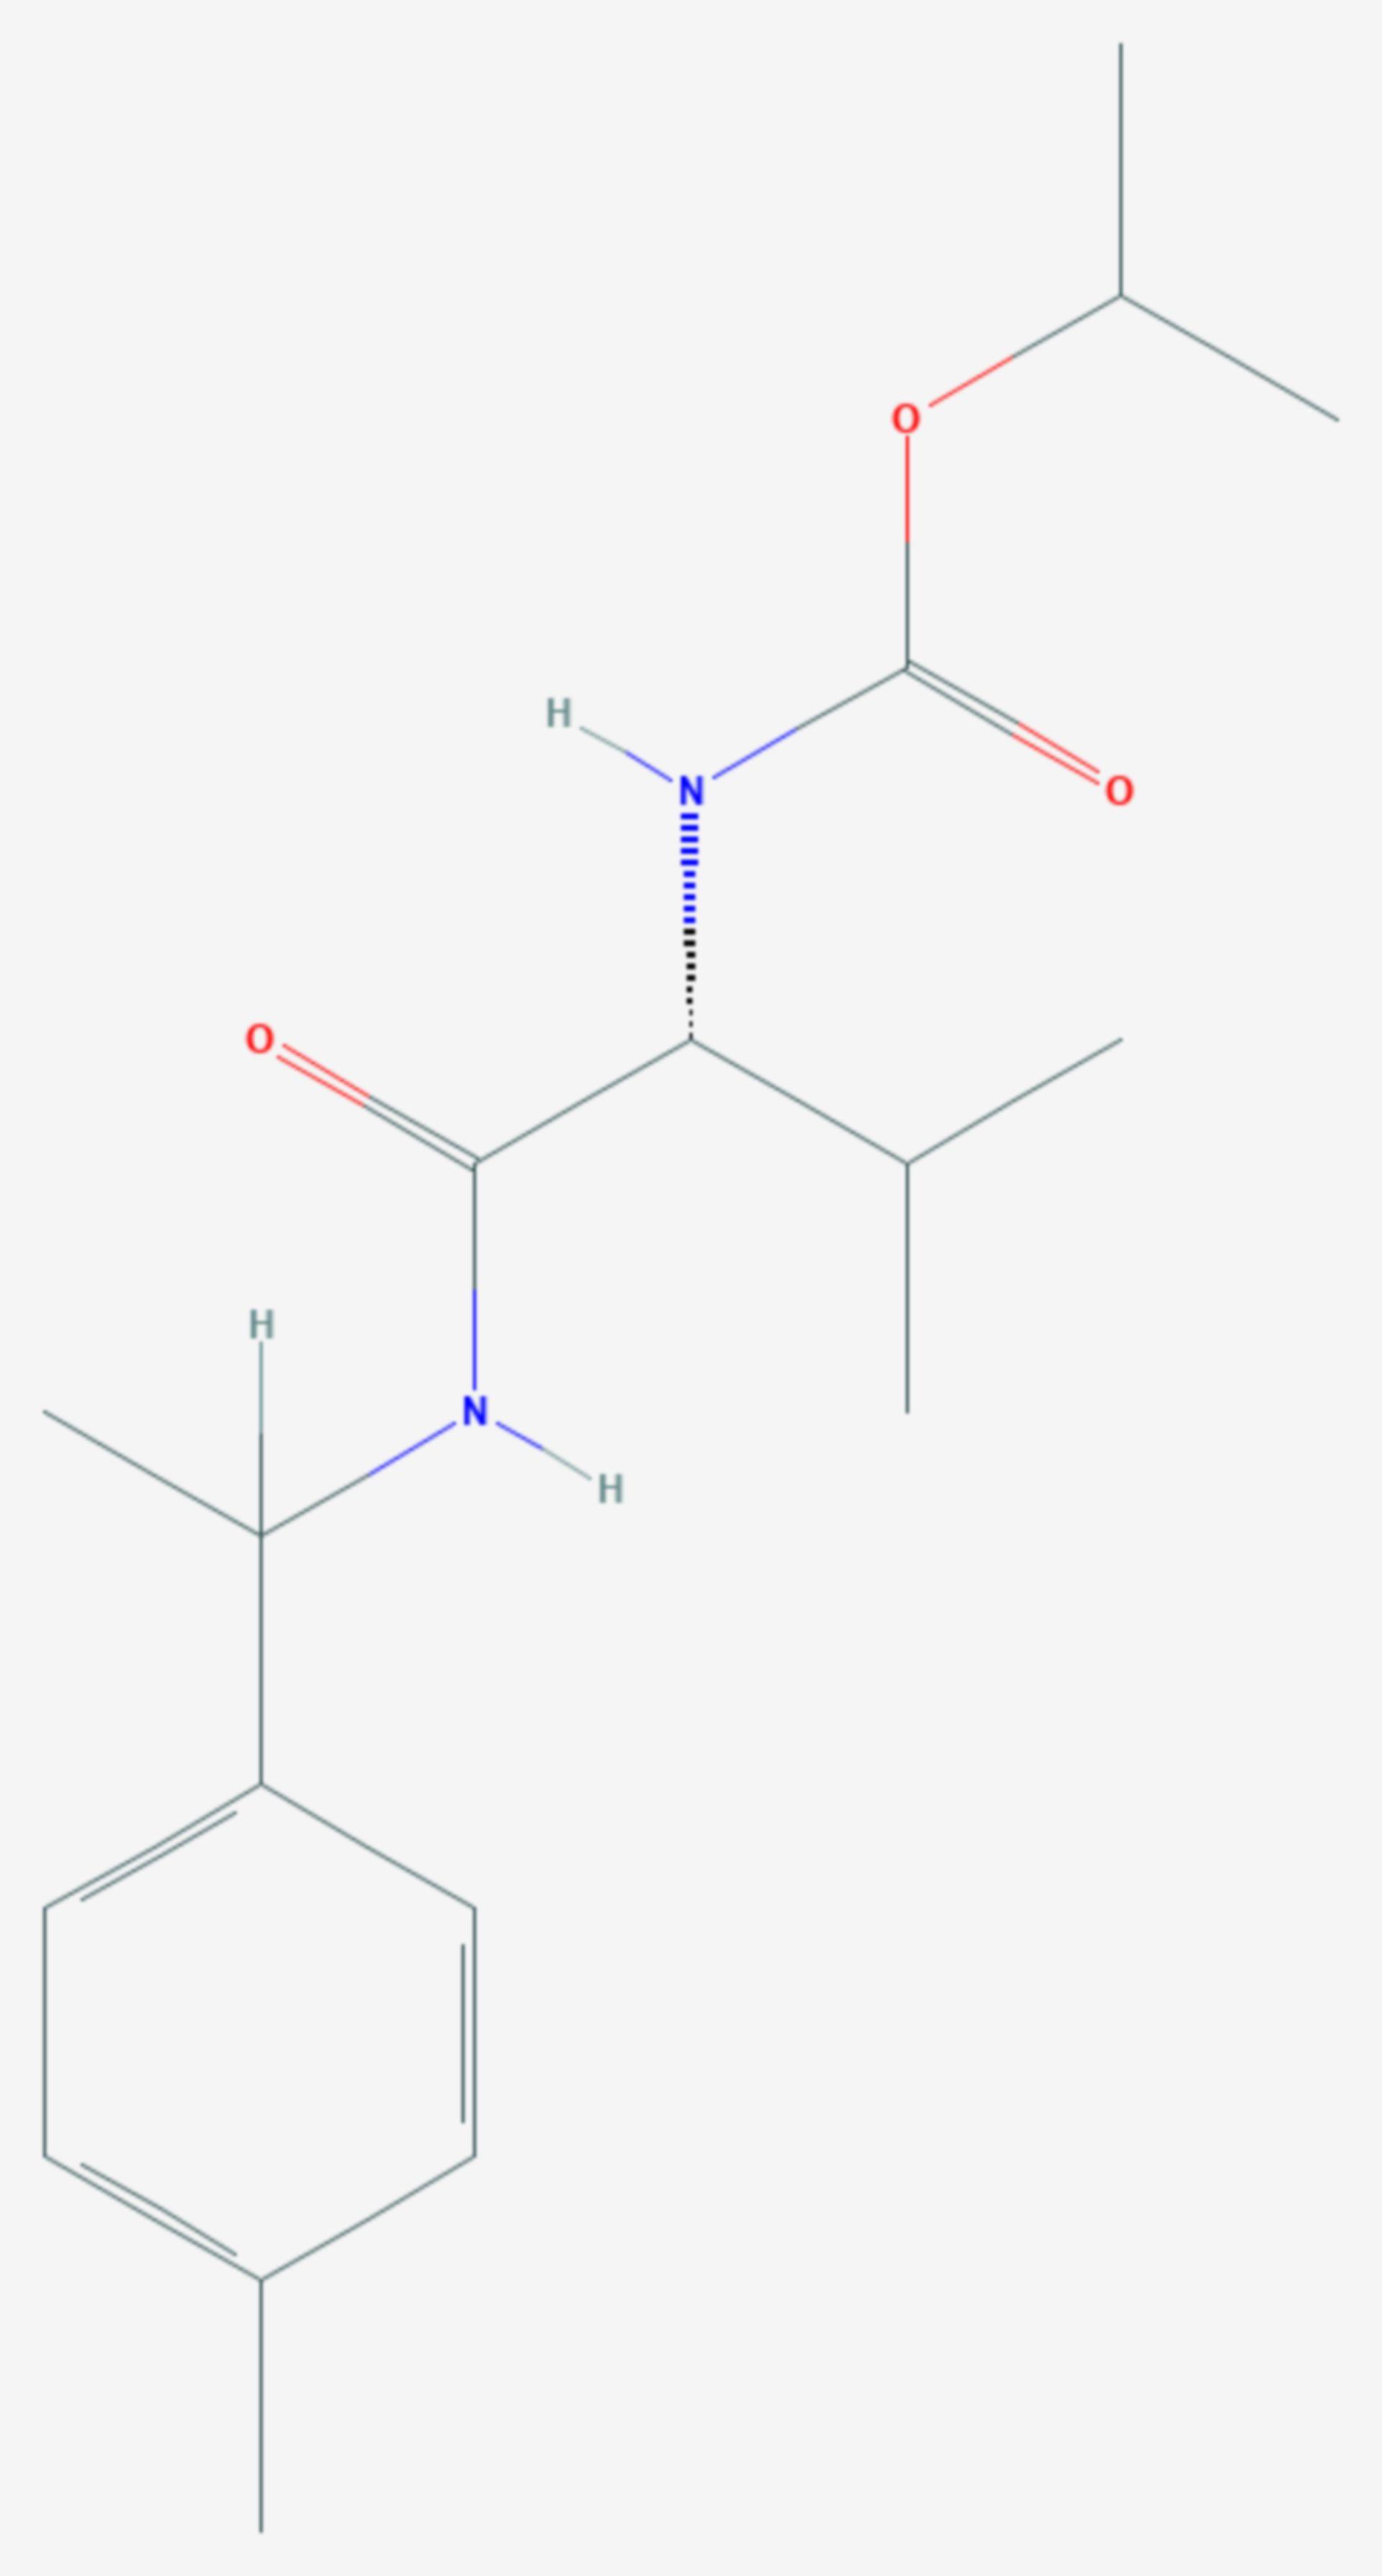 Iprovalicarb (Strukturformel)